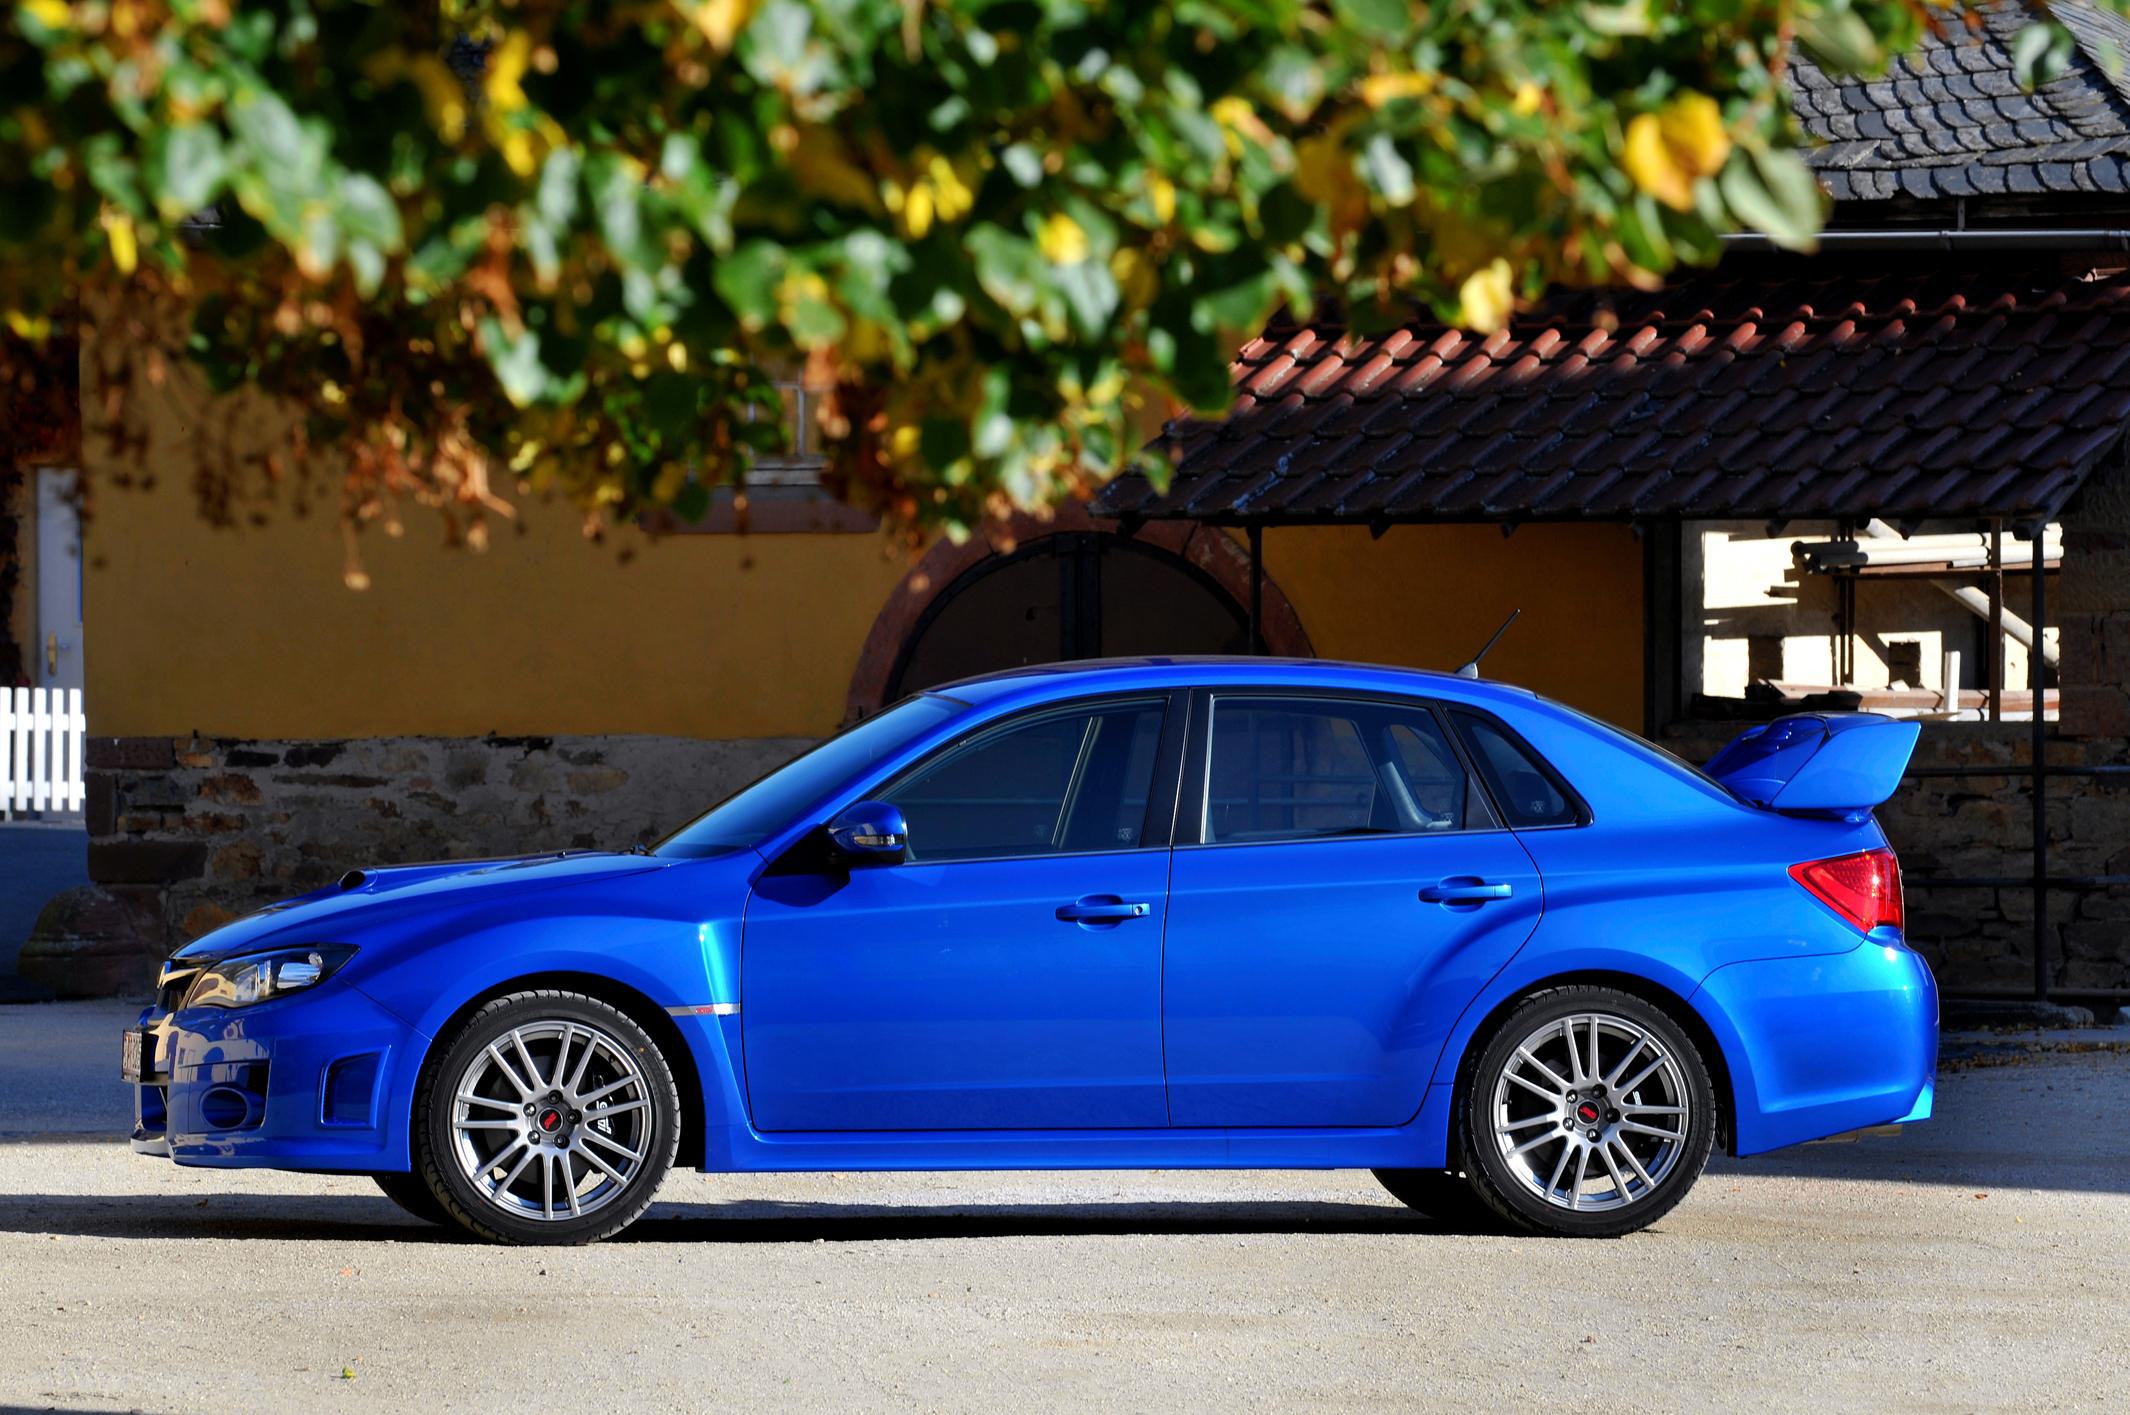 Subaru WRX STI Impreza 2010